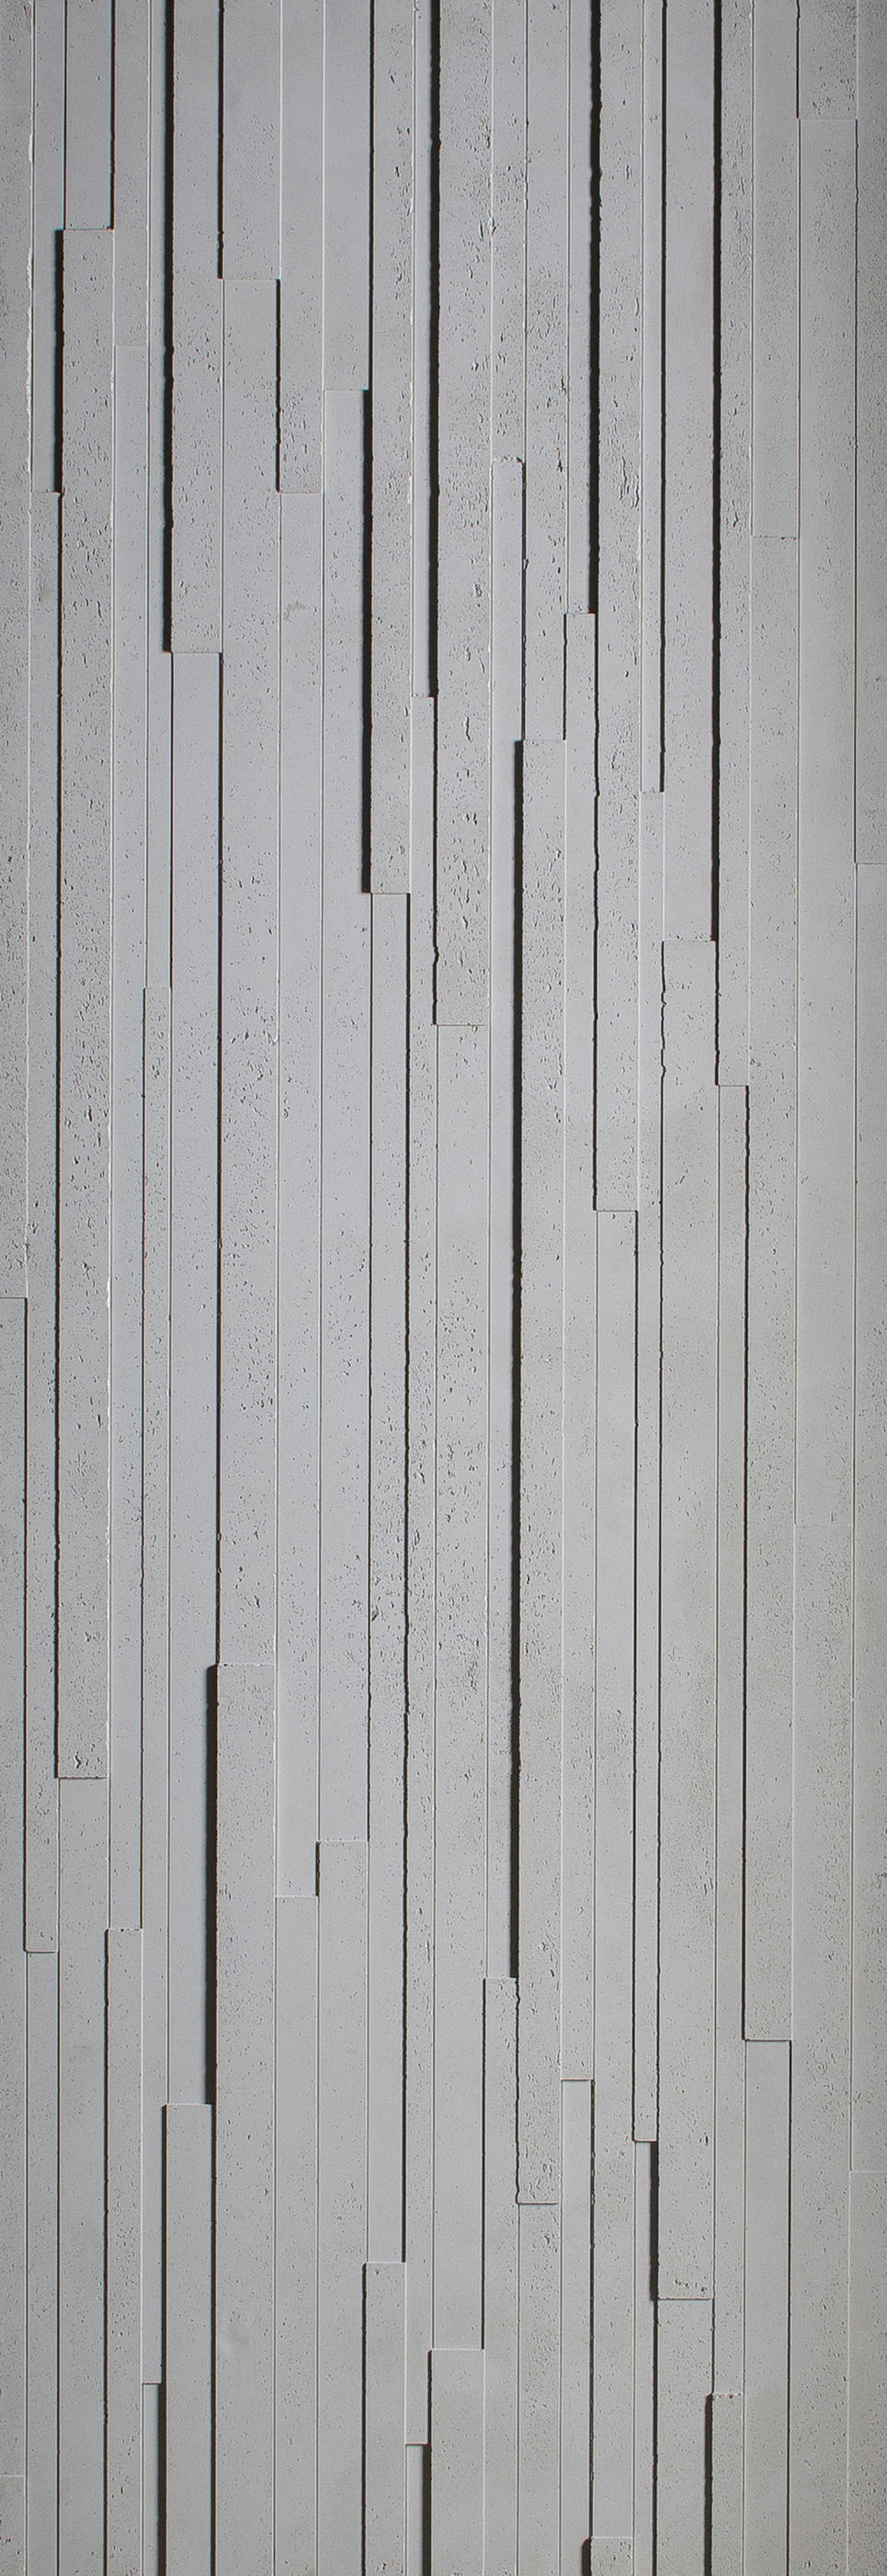 panbeton slats concrete panels from concrete lcda architonic. Black Bedroom Furniture Sets. Home Design Ideas